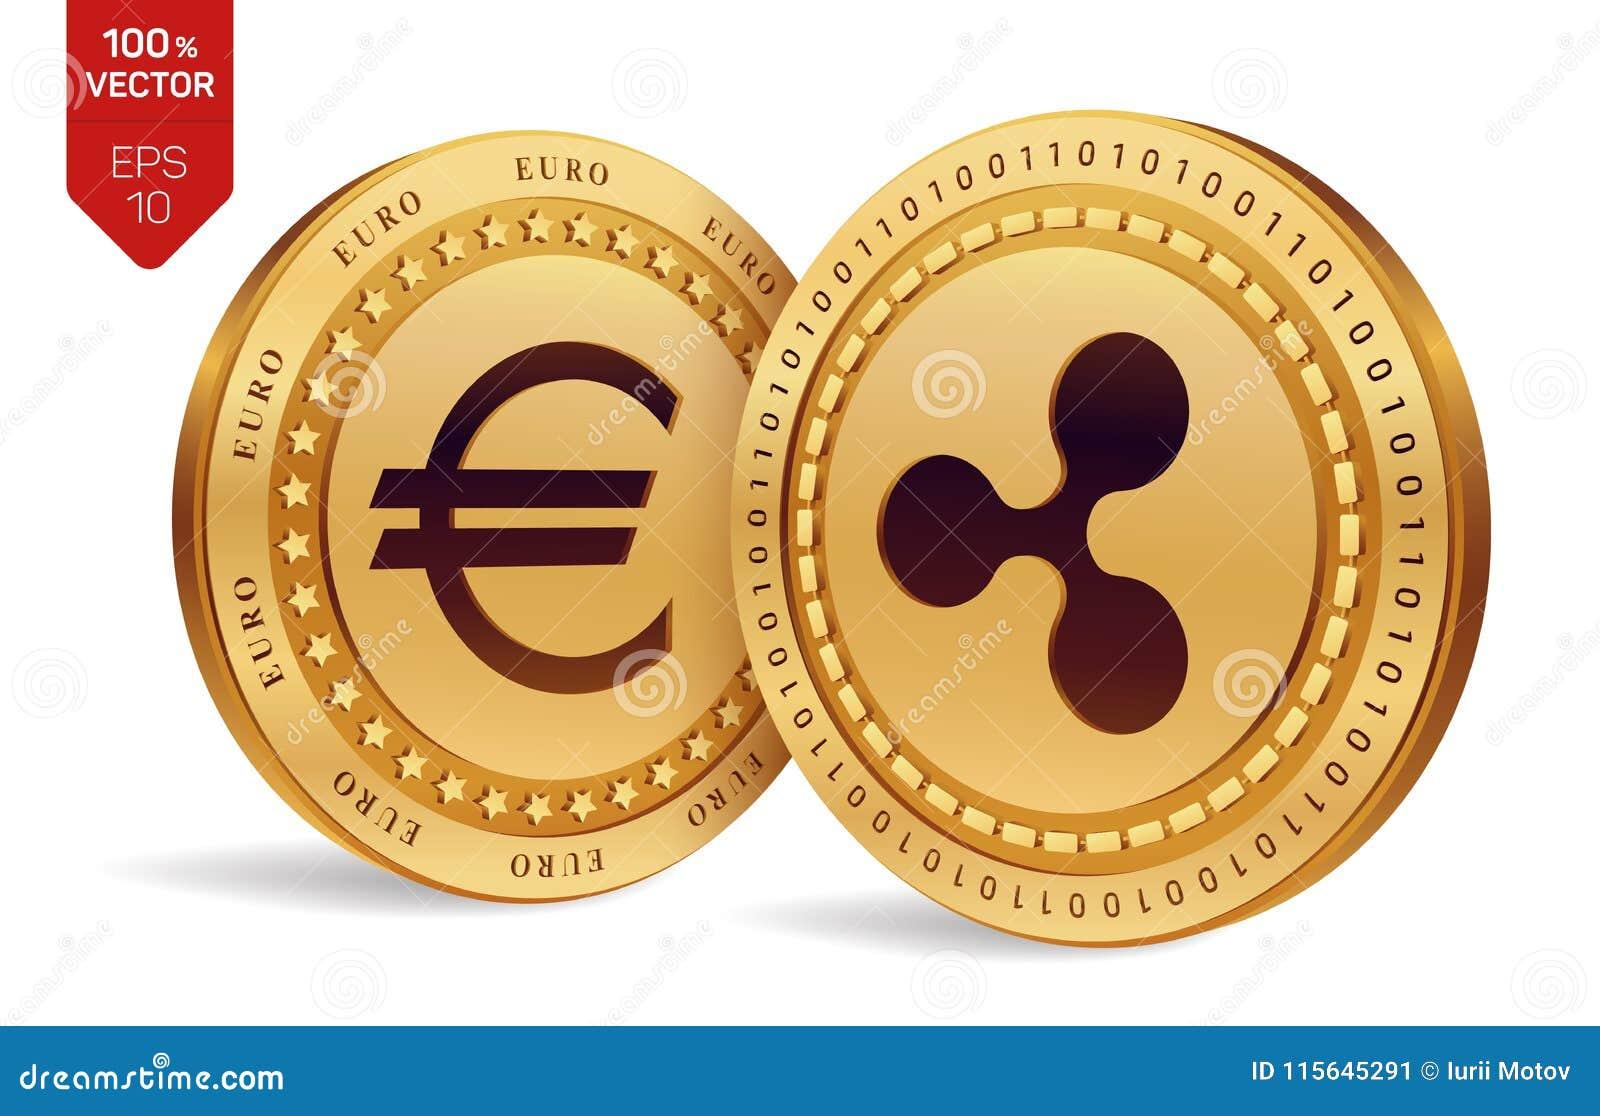 ripple coin euro